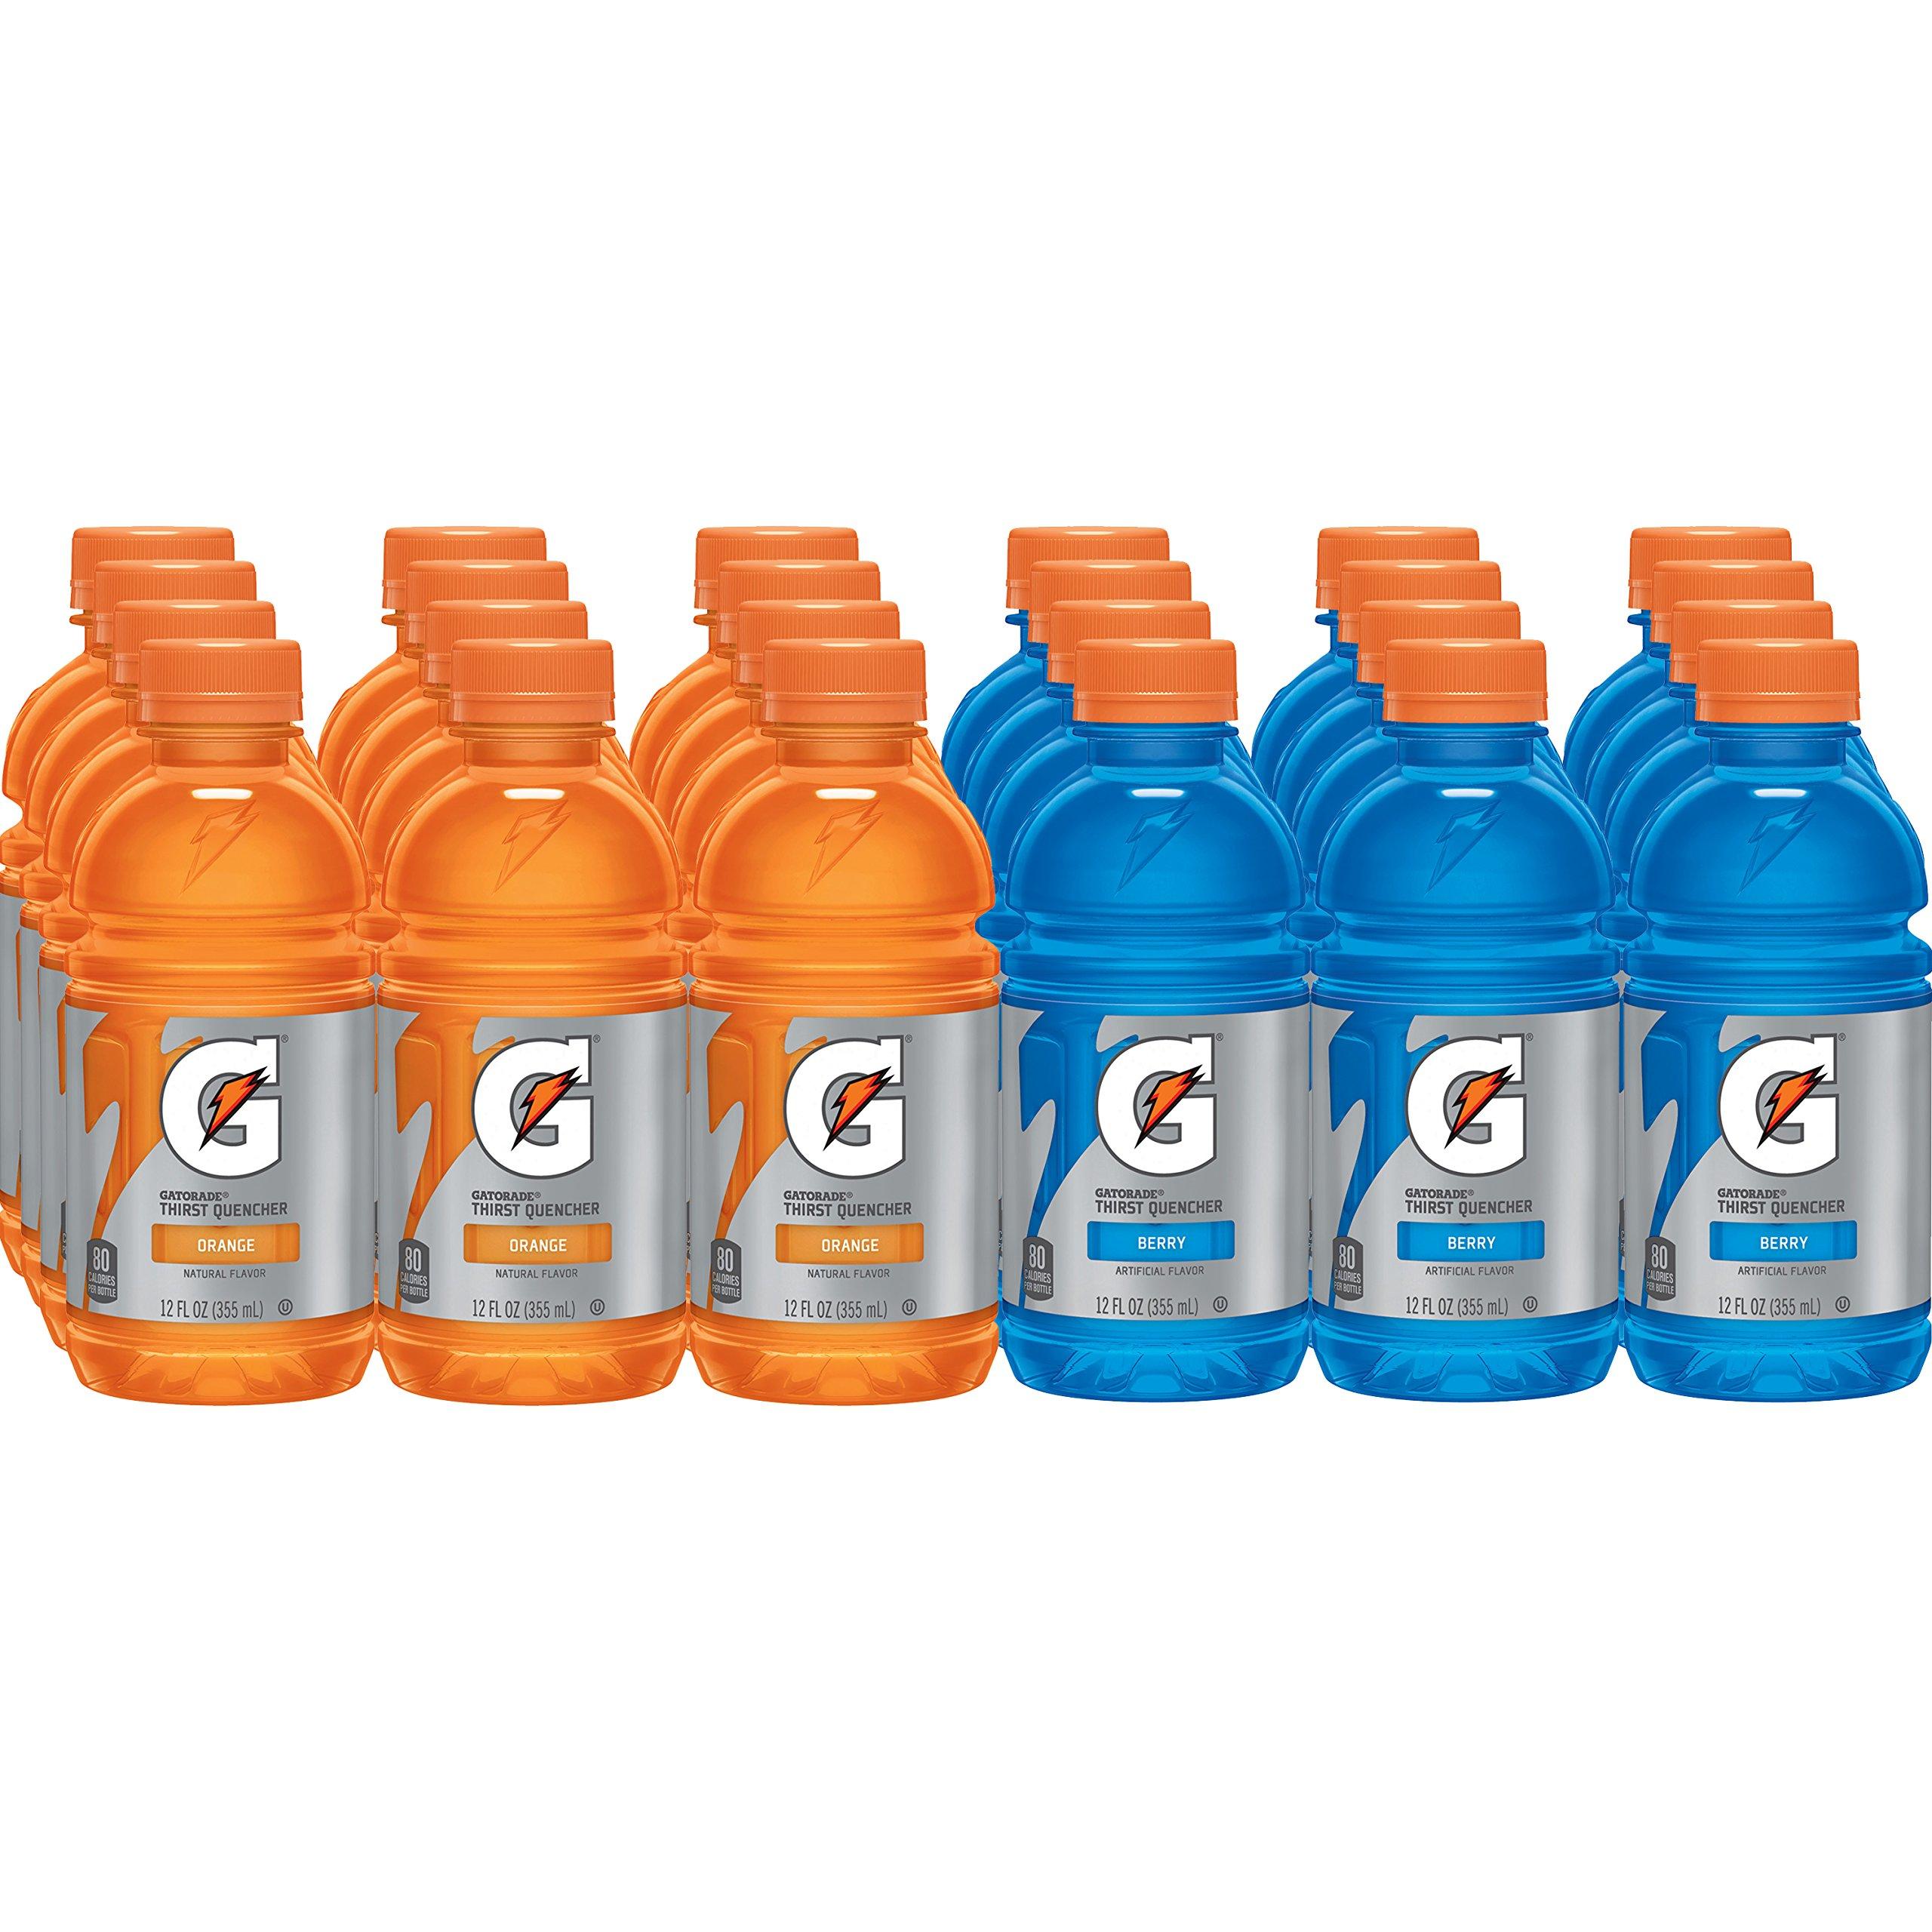 Gatorade Thirst Quencher, Orange and Berry Variety Pack, 12 Fl Oz (Pack of 24)